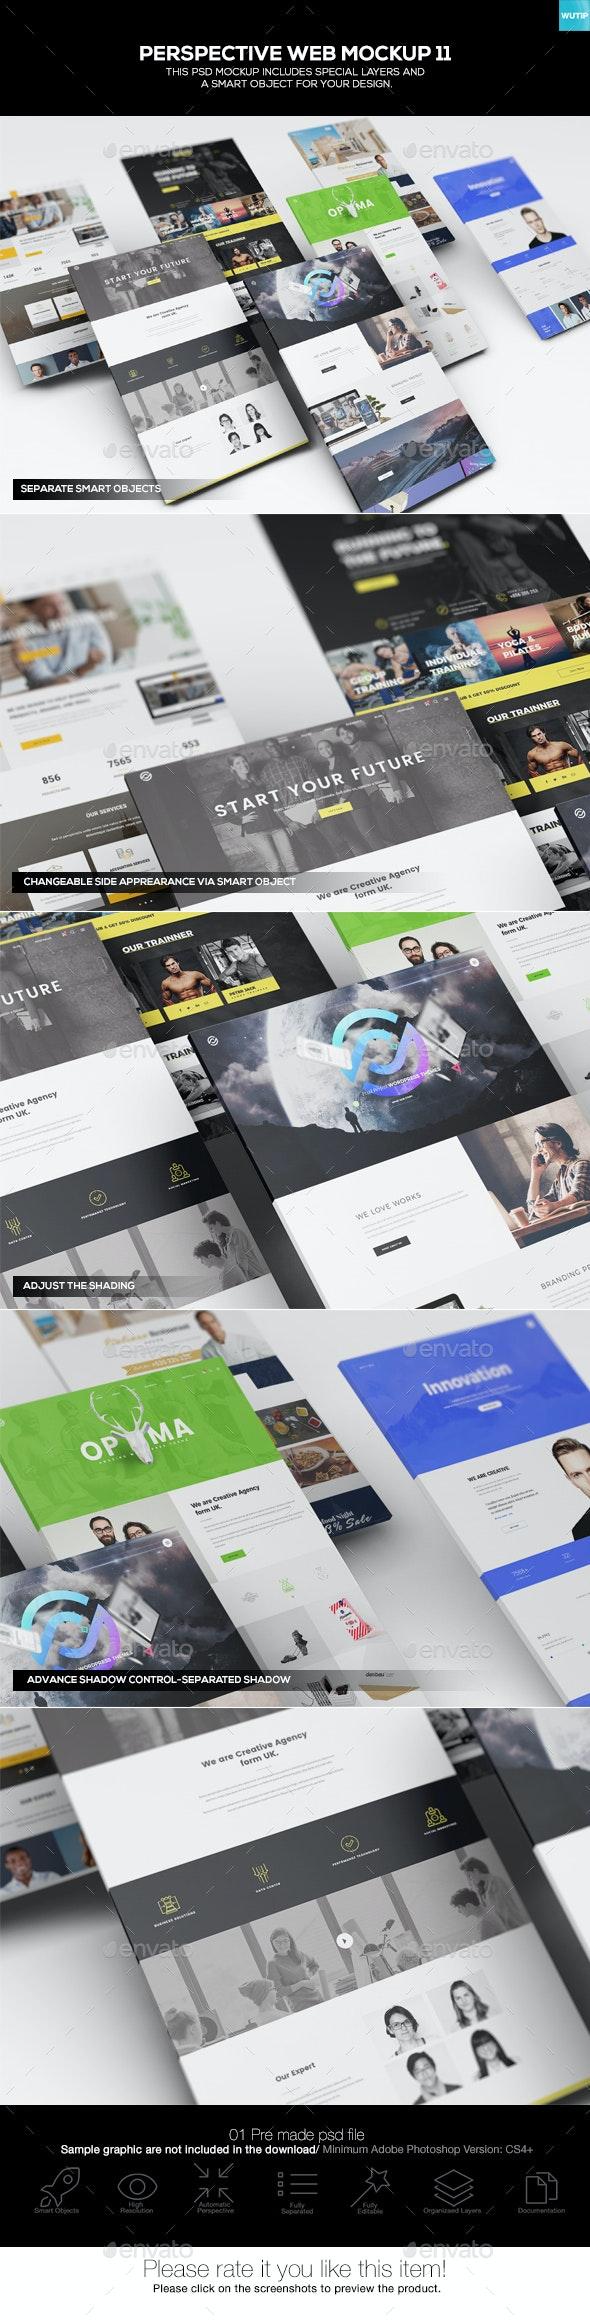 Perspective Web Mockup 11 - Website Displays